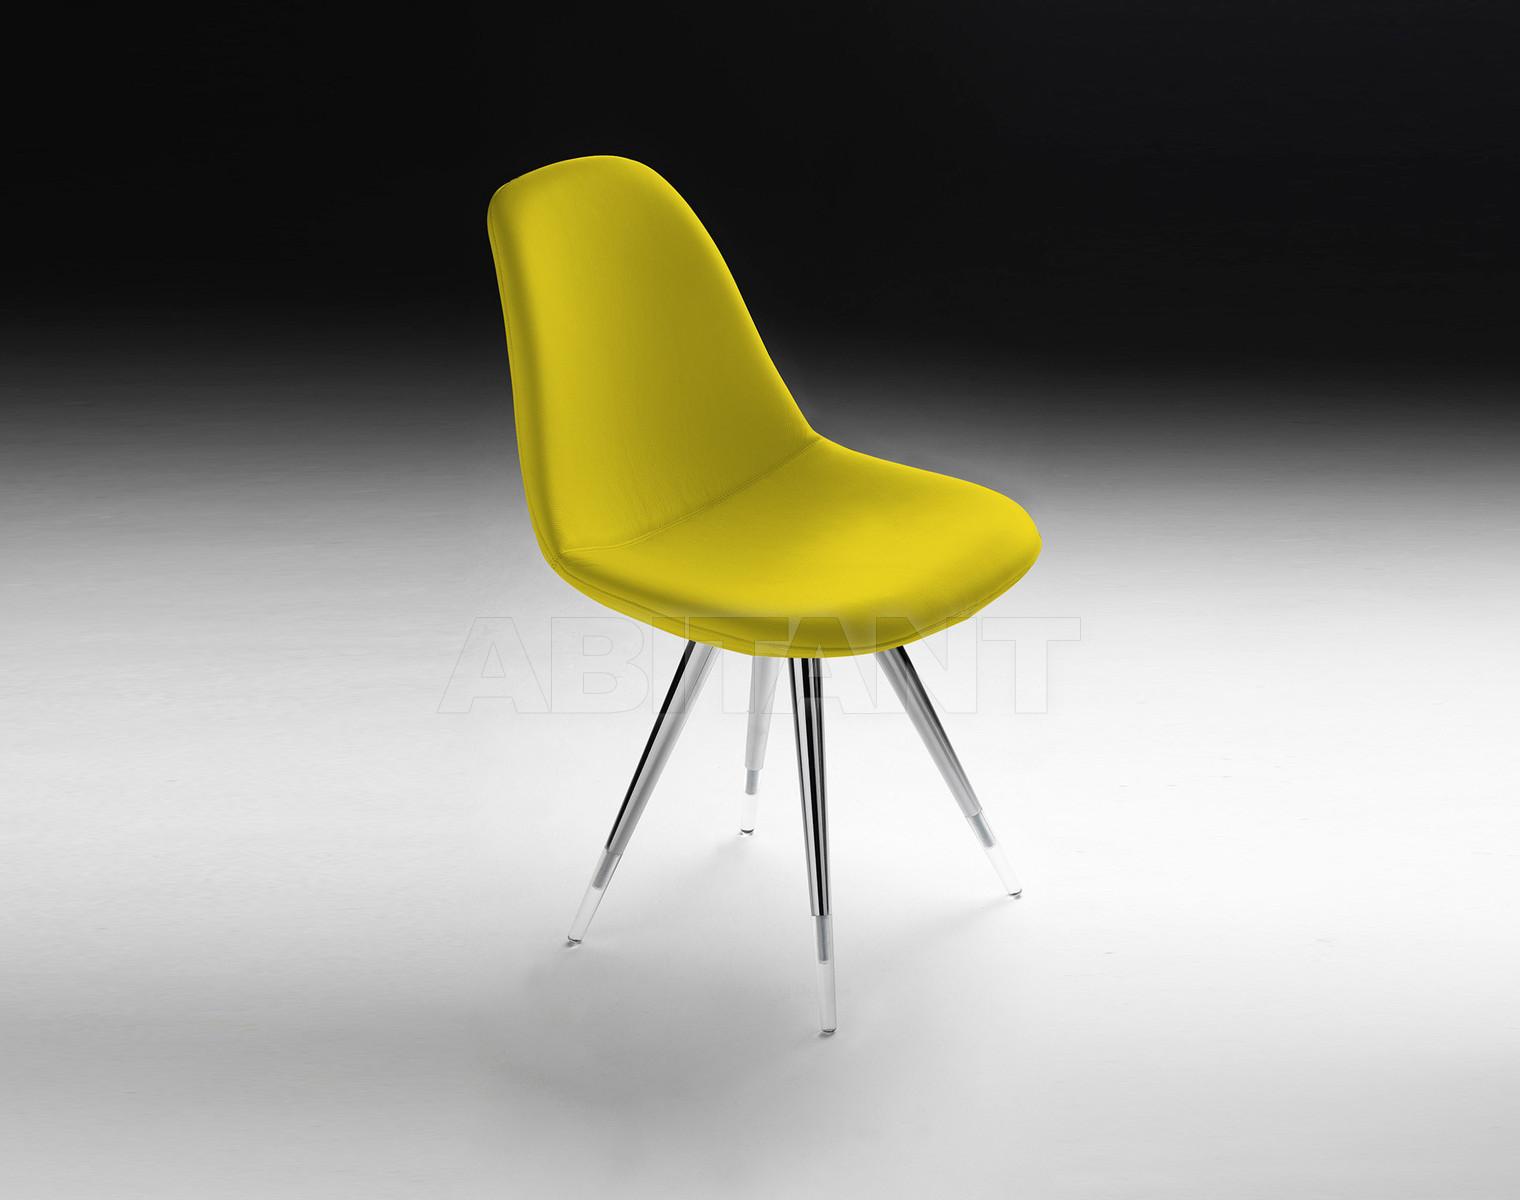 Купить Стул Kubikoff Gino Lemson & Ruud Bos Angel'POP'Chair' 09